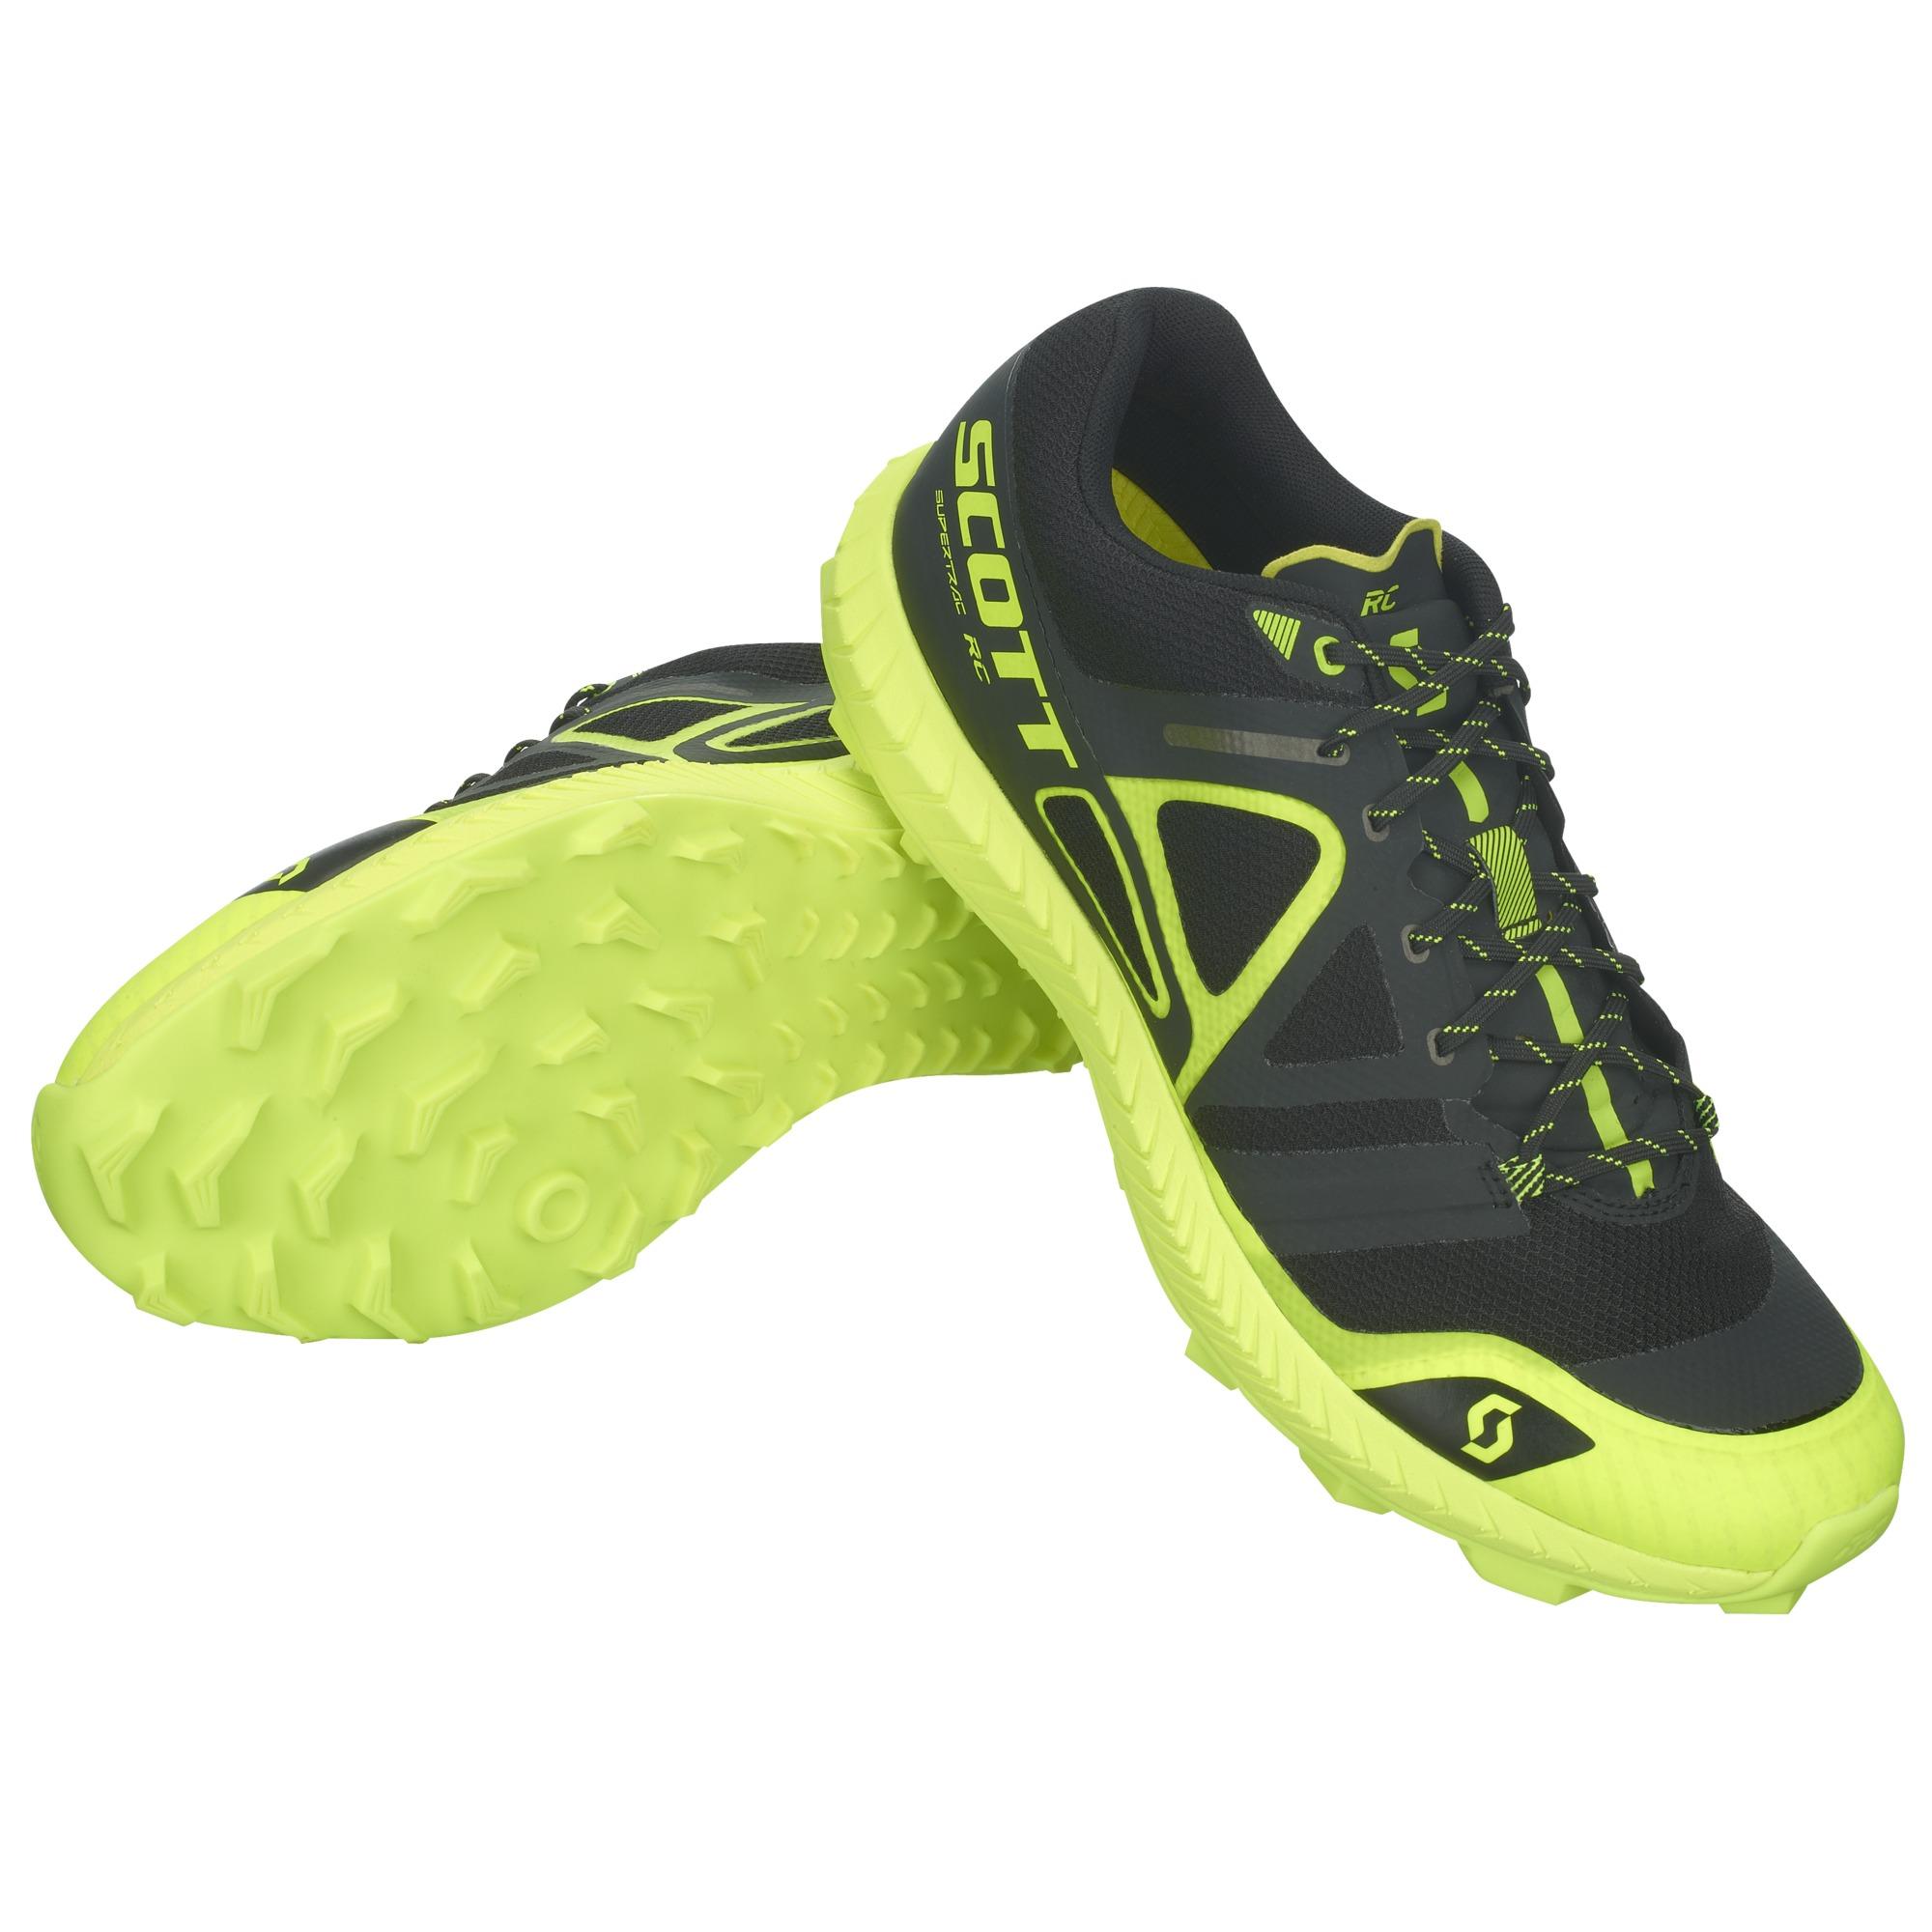 Bežecká obuv SCOTT Supertrac RC